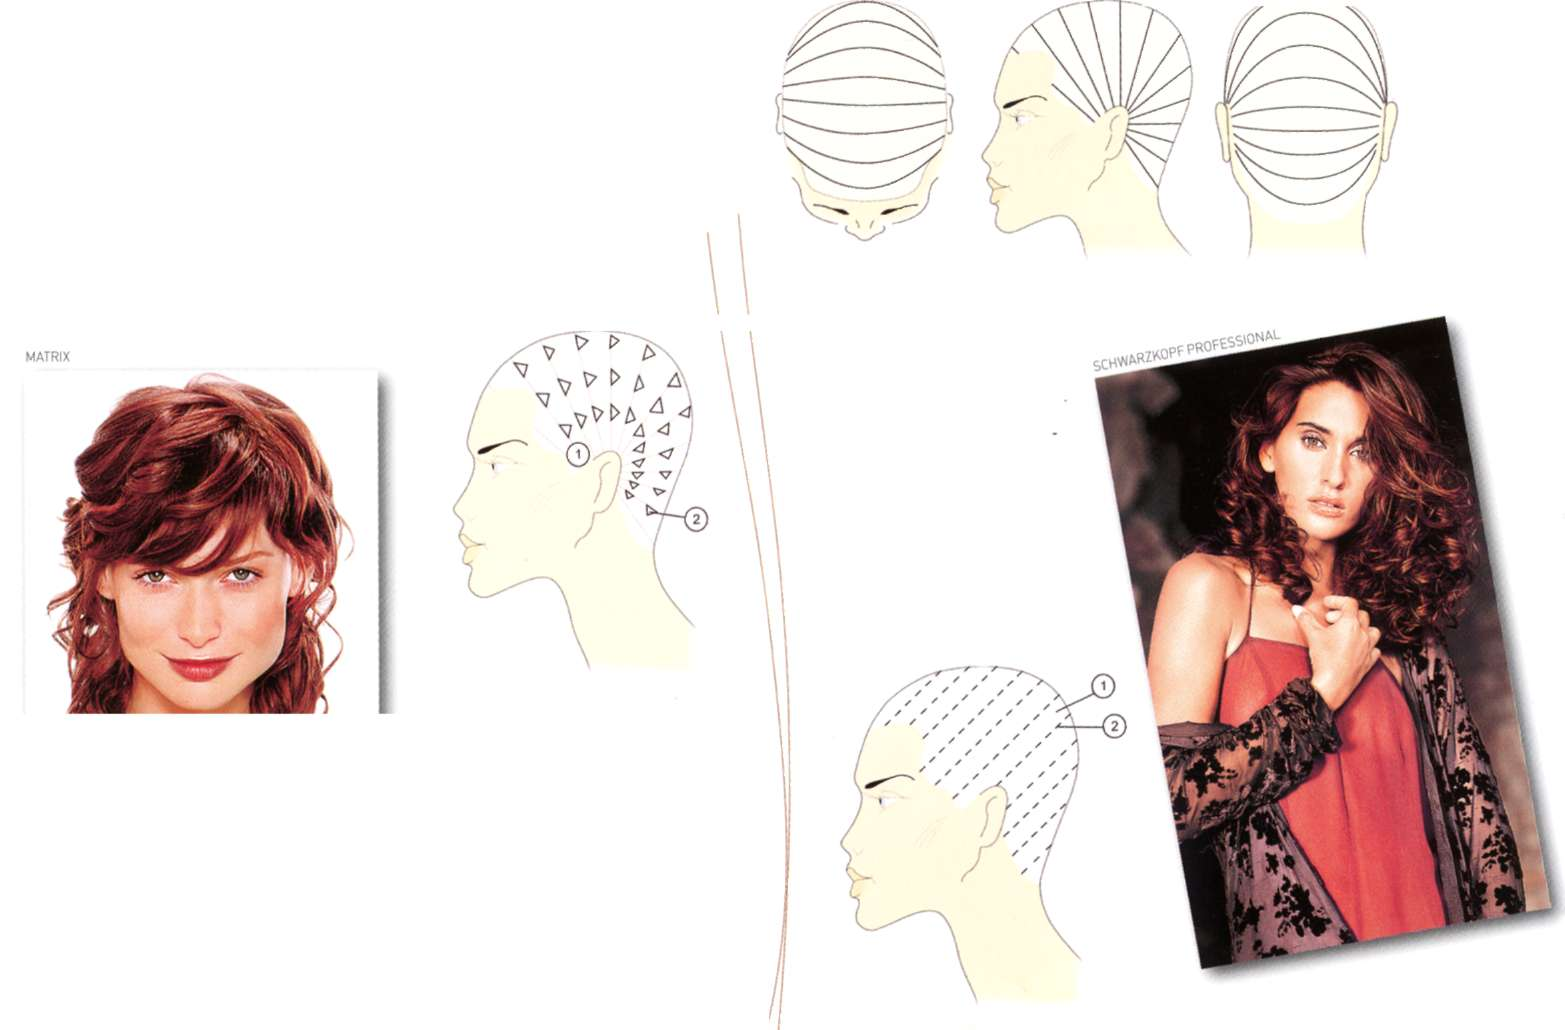 Схема окрашивания волос в один тон фото